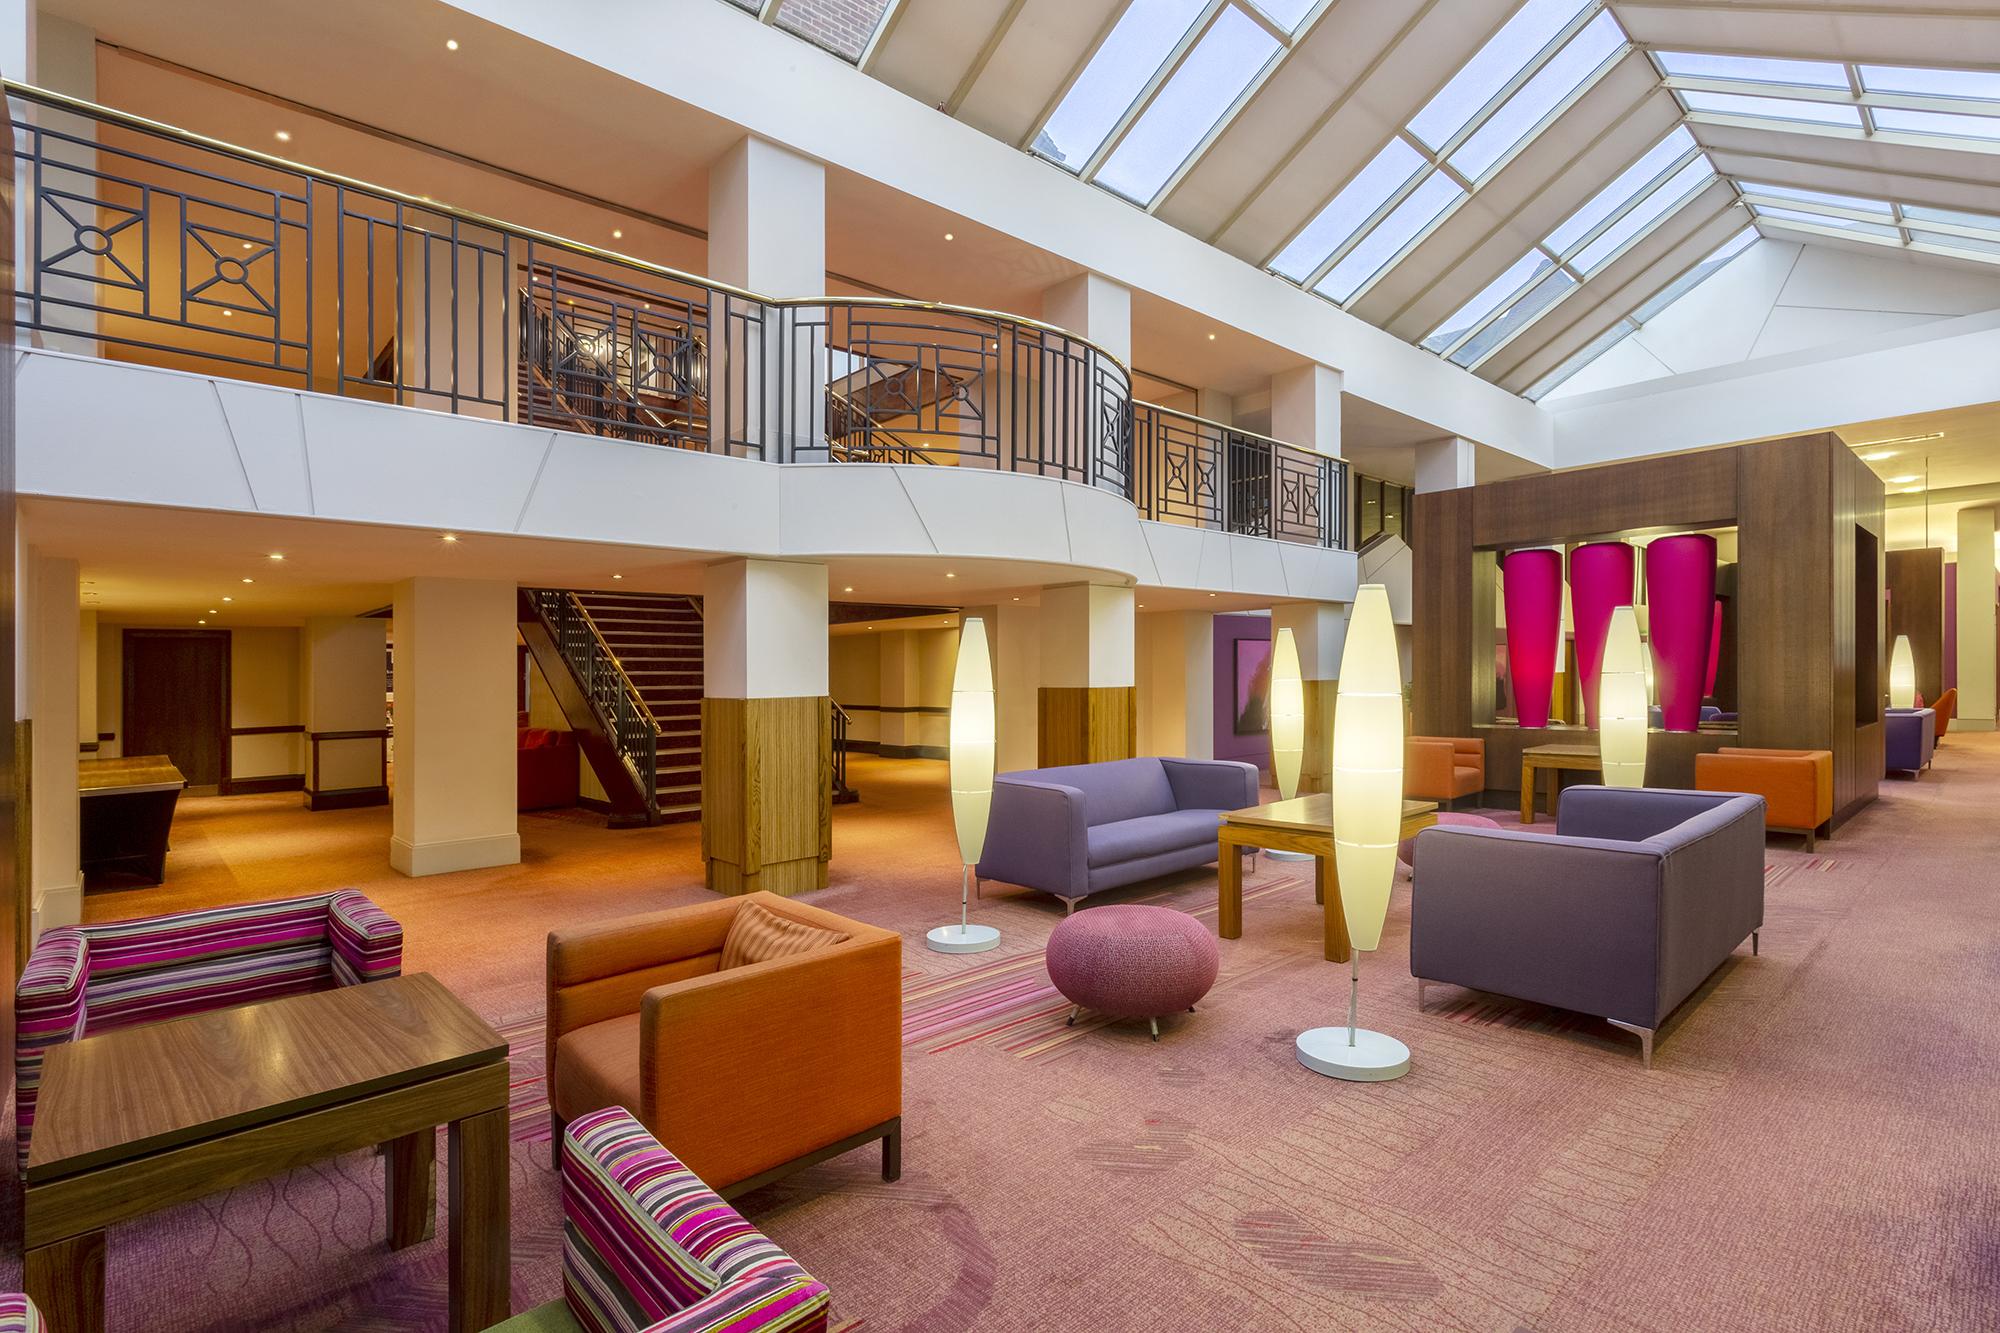 Ashford International Hotel & Spa | 4 Star Hotels in Kent